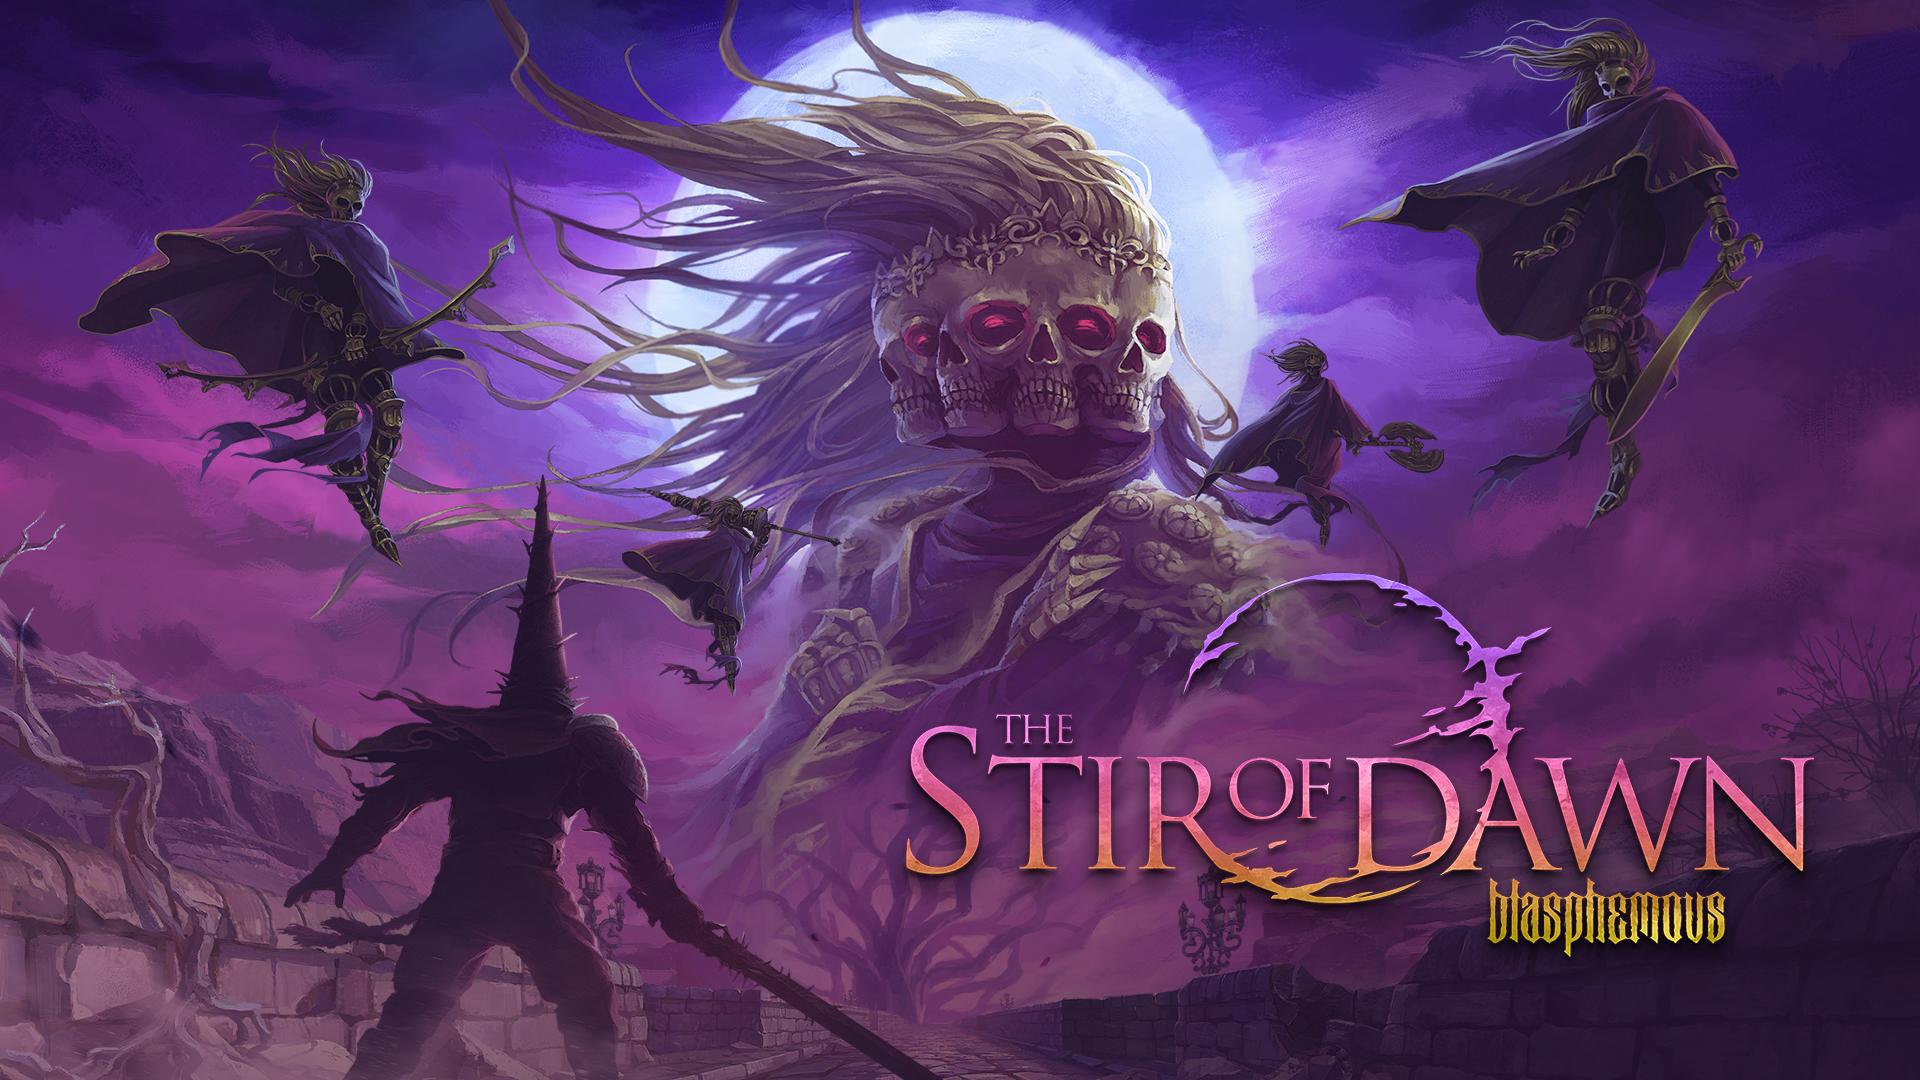 Blasphemous: Stir of Dawn – Free DLC Launching August 4th!